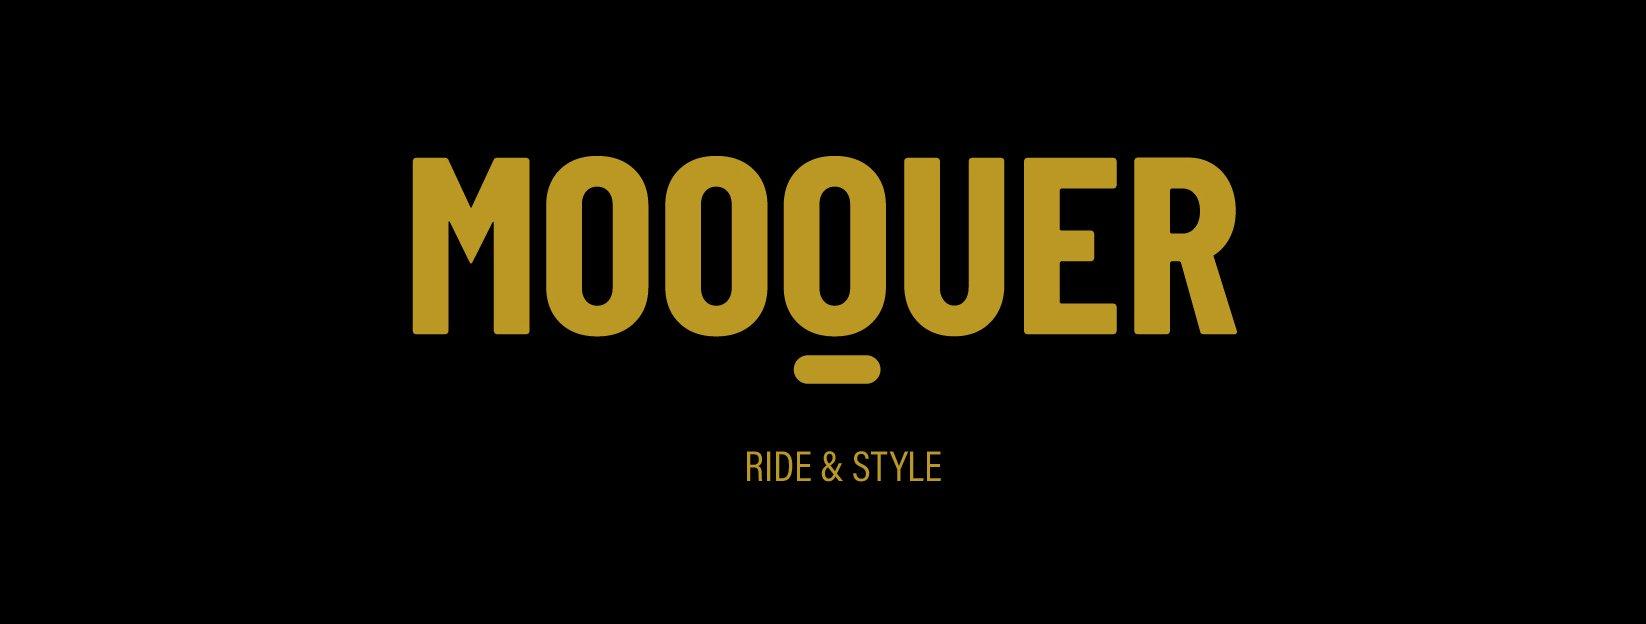 Mooquer-ropa-de-ciclismo-logo-rectangular-fondo-negro-mostaza